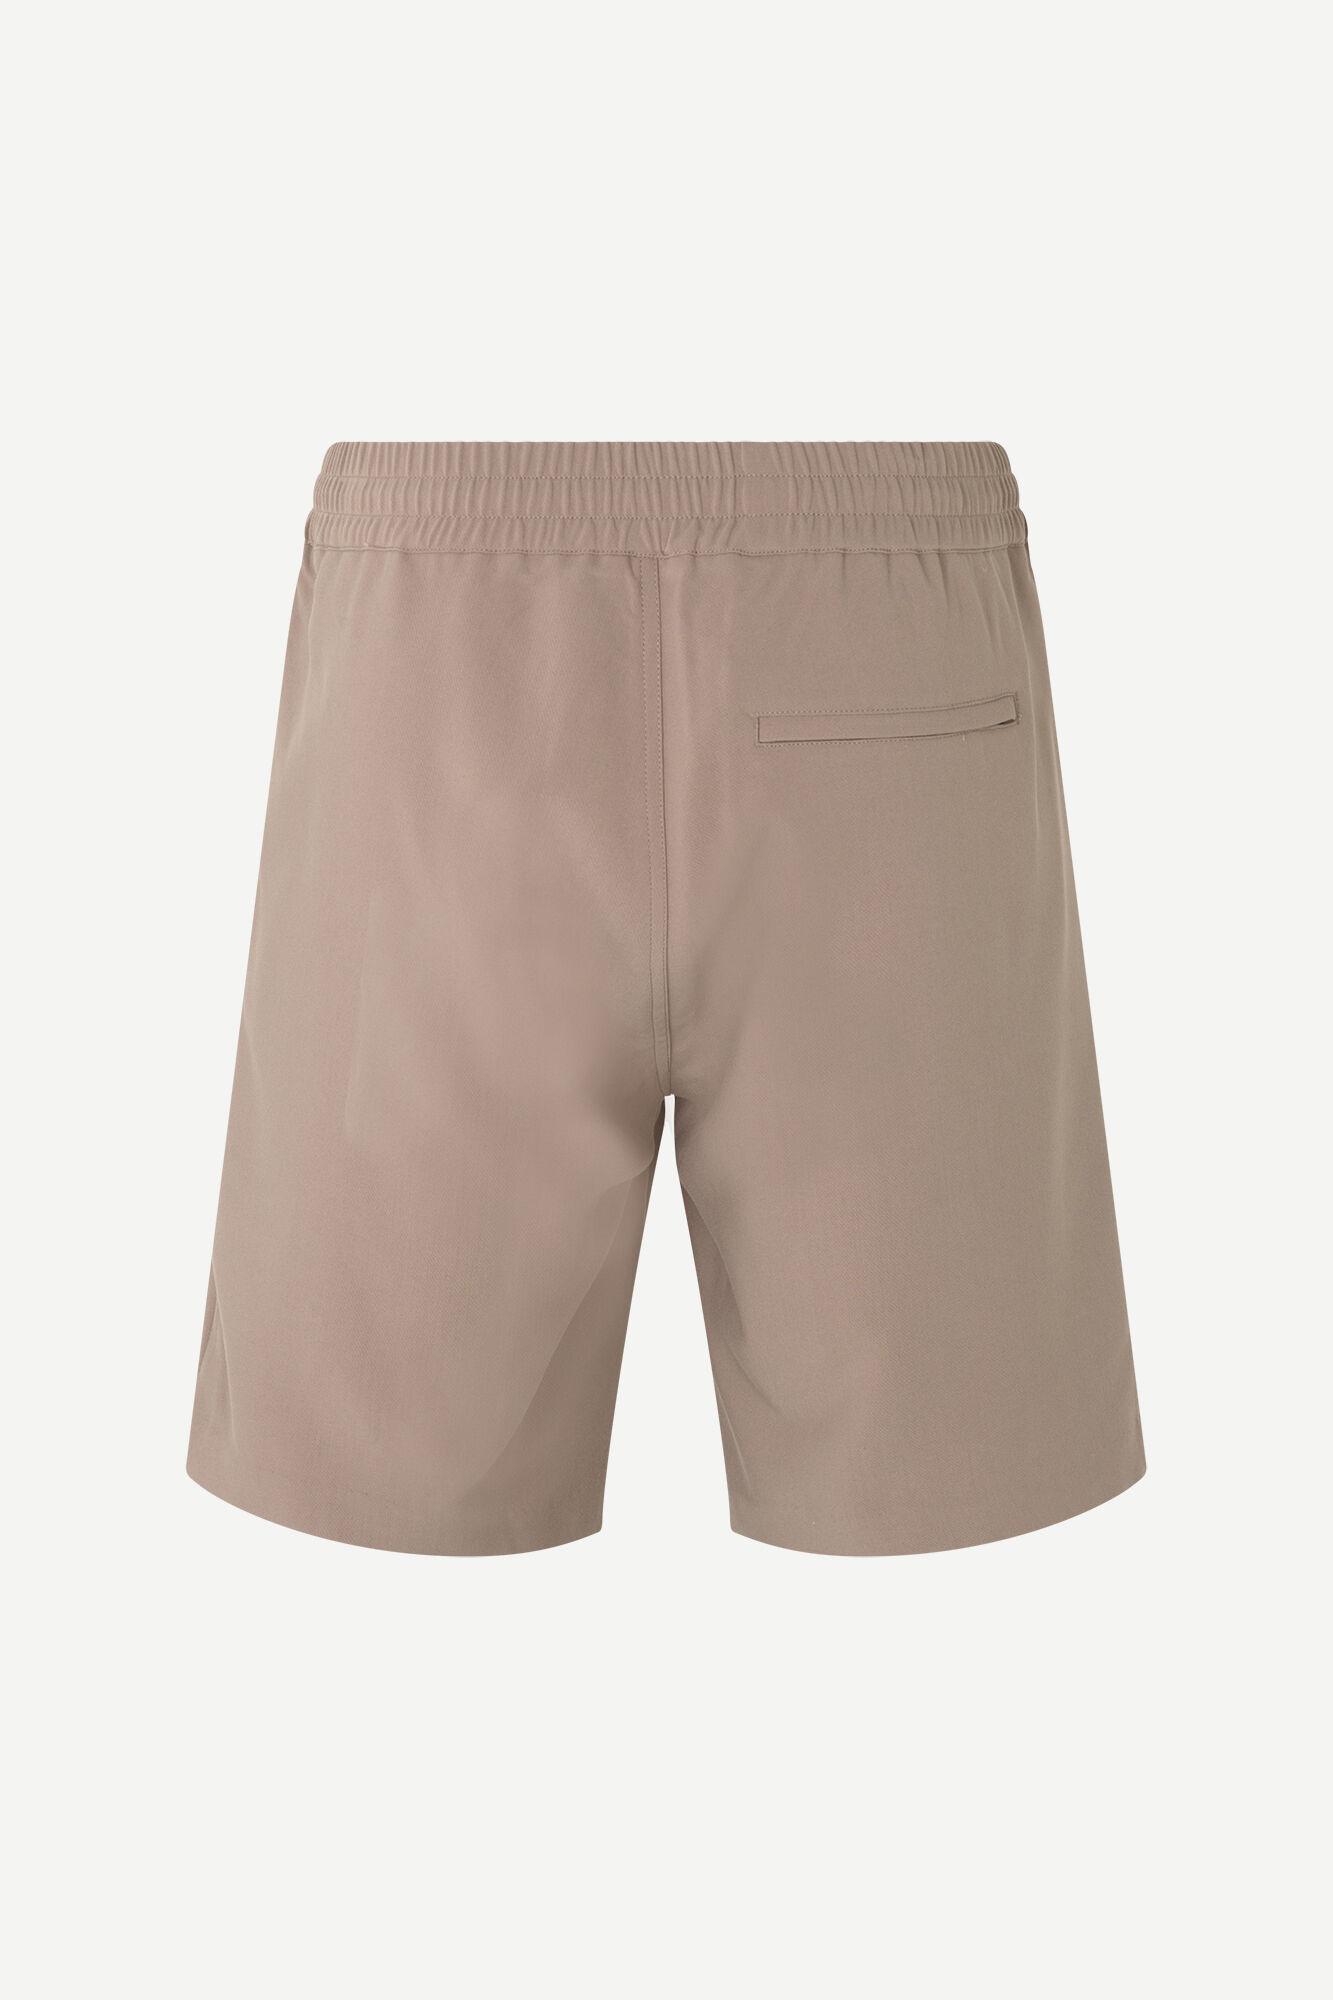 Smith Summer Shorts Caribou Brown-3